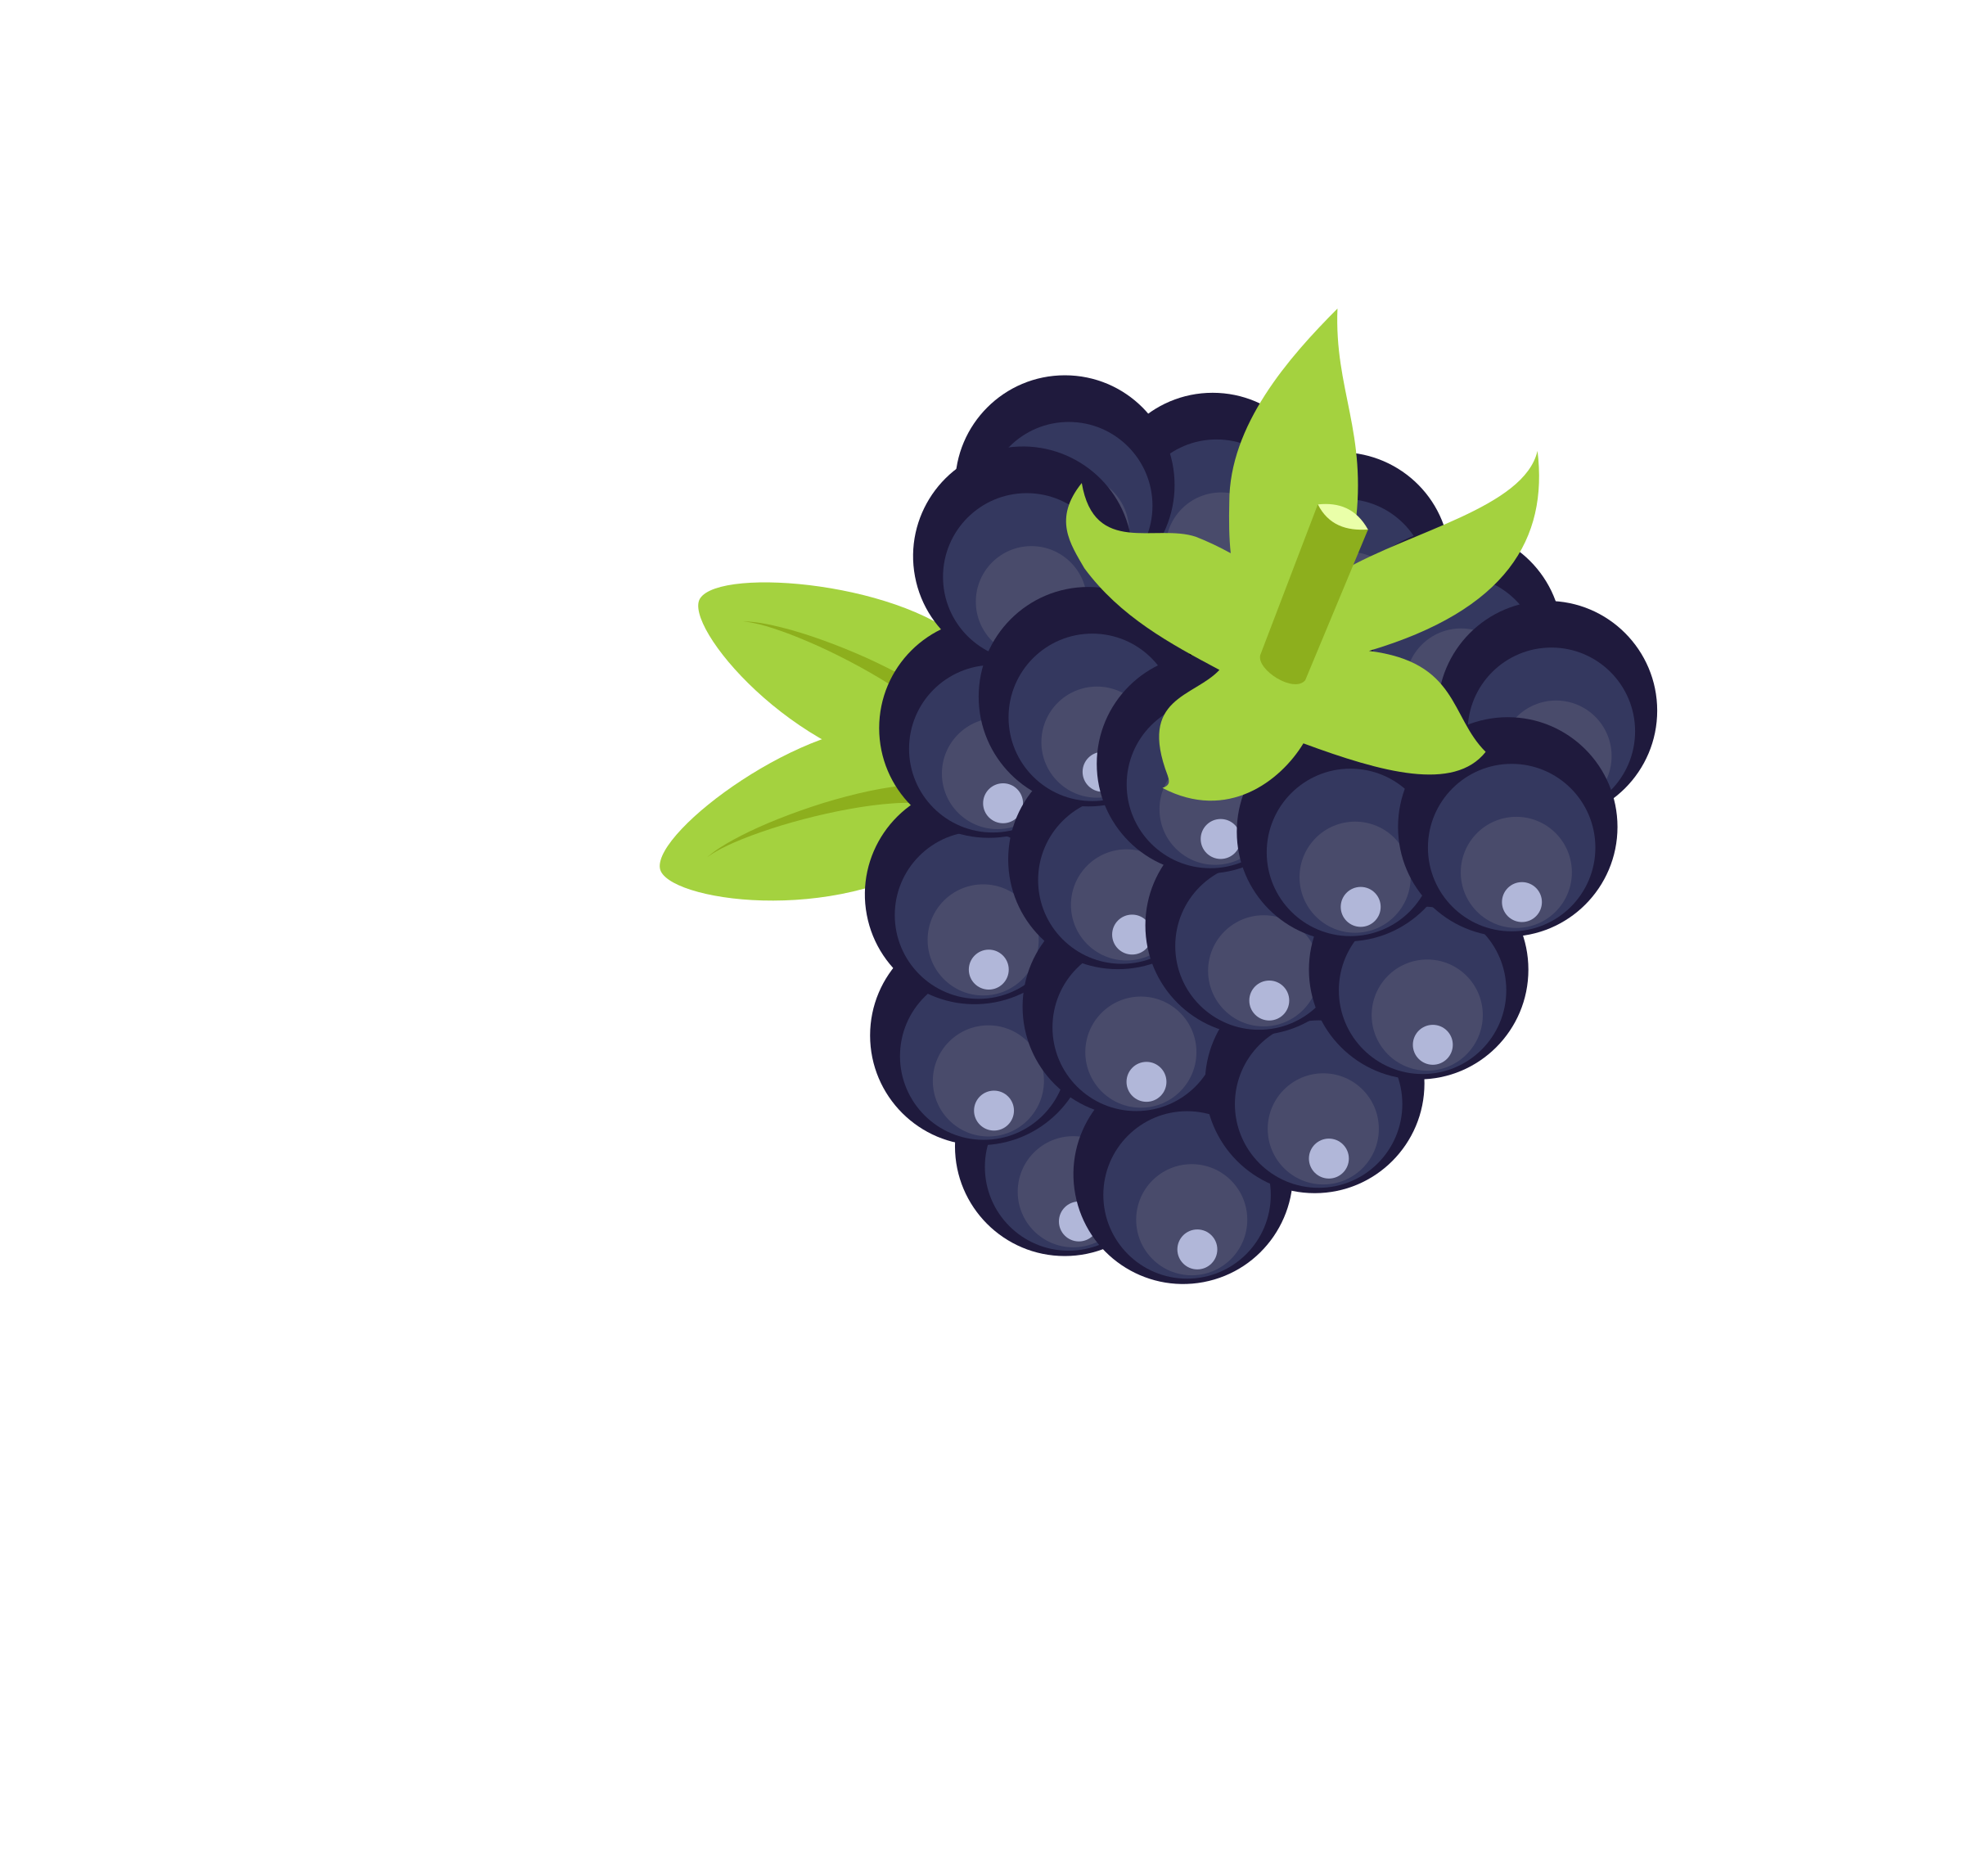 Blackberry vector clipart image.